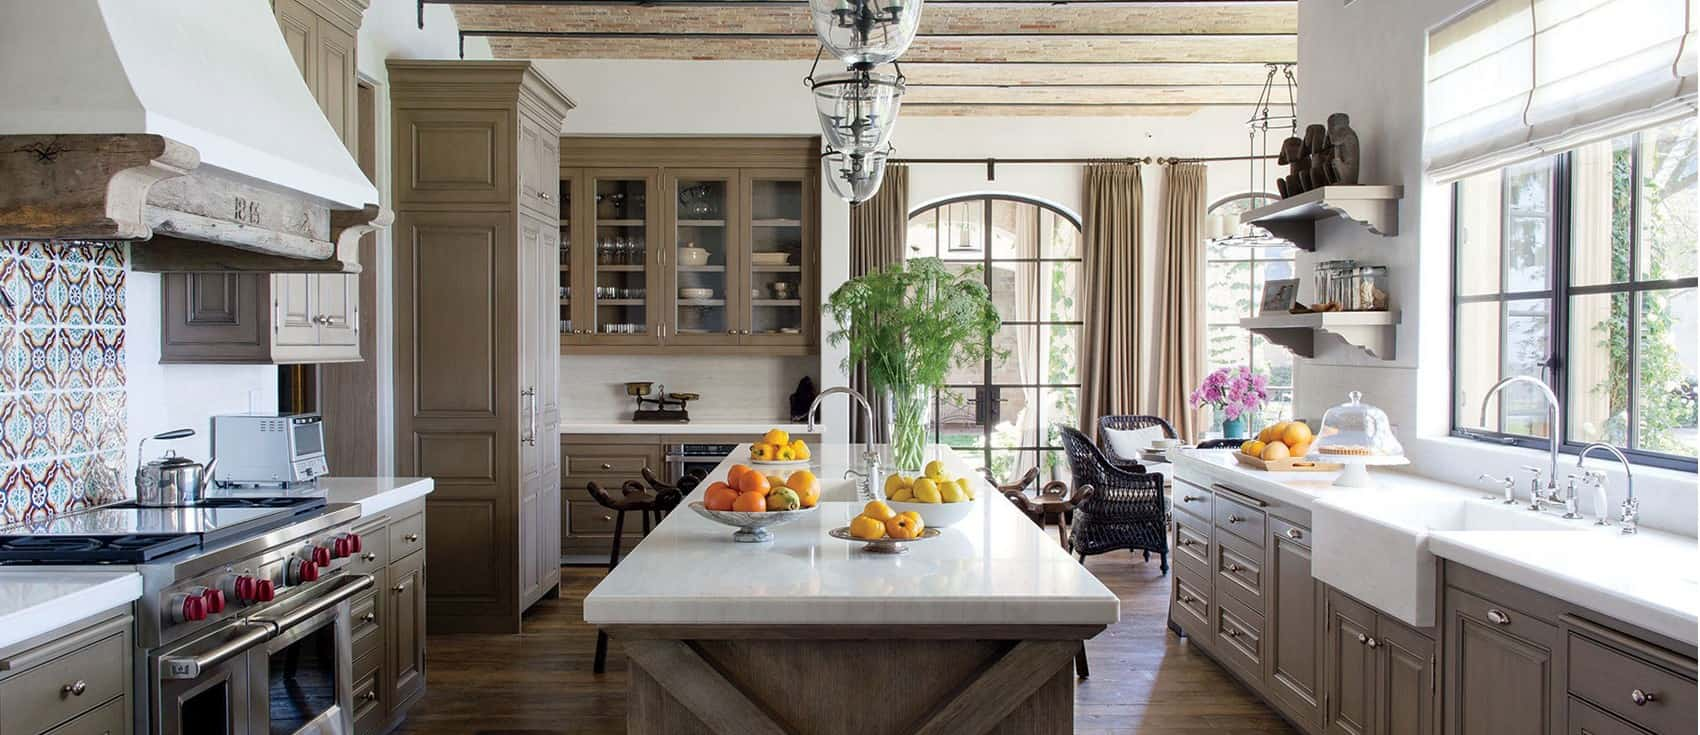 Farmhouse Style Decor & Country Decorating Ideas